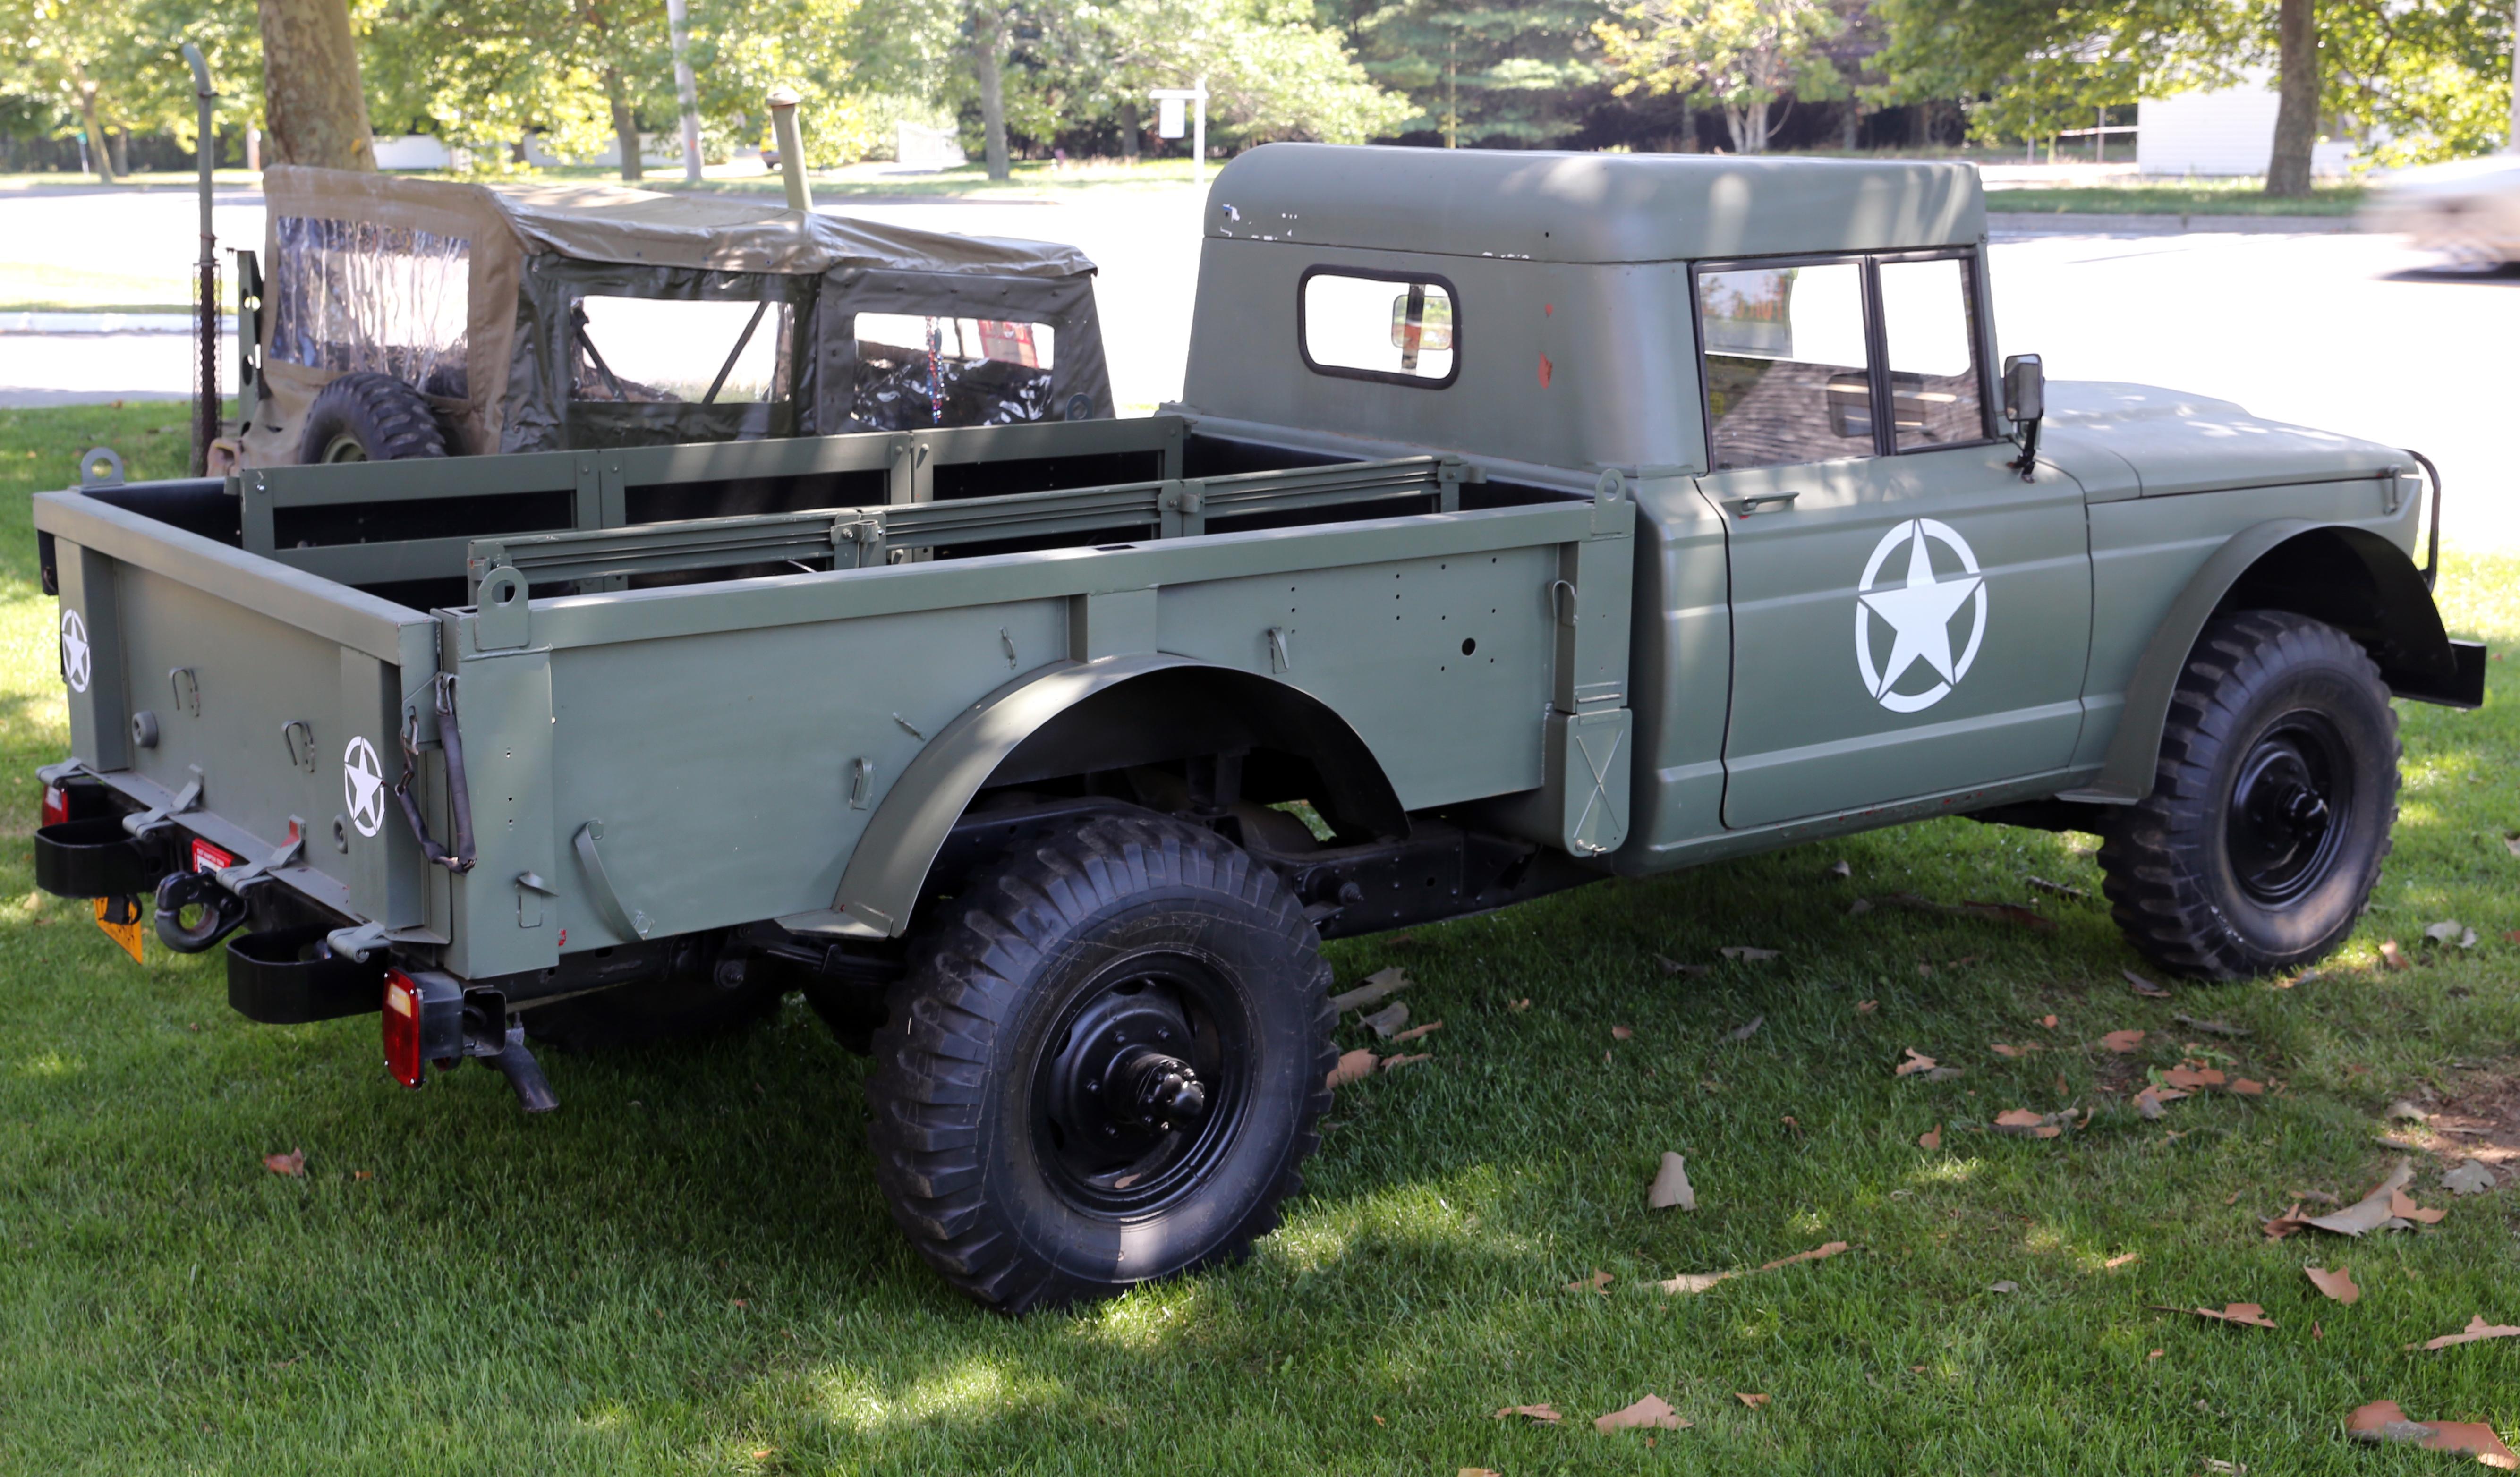 File:1967 Kaiser Jeep M715 rear.jpg - Wikimedia Commons